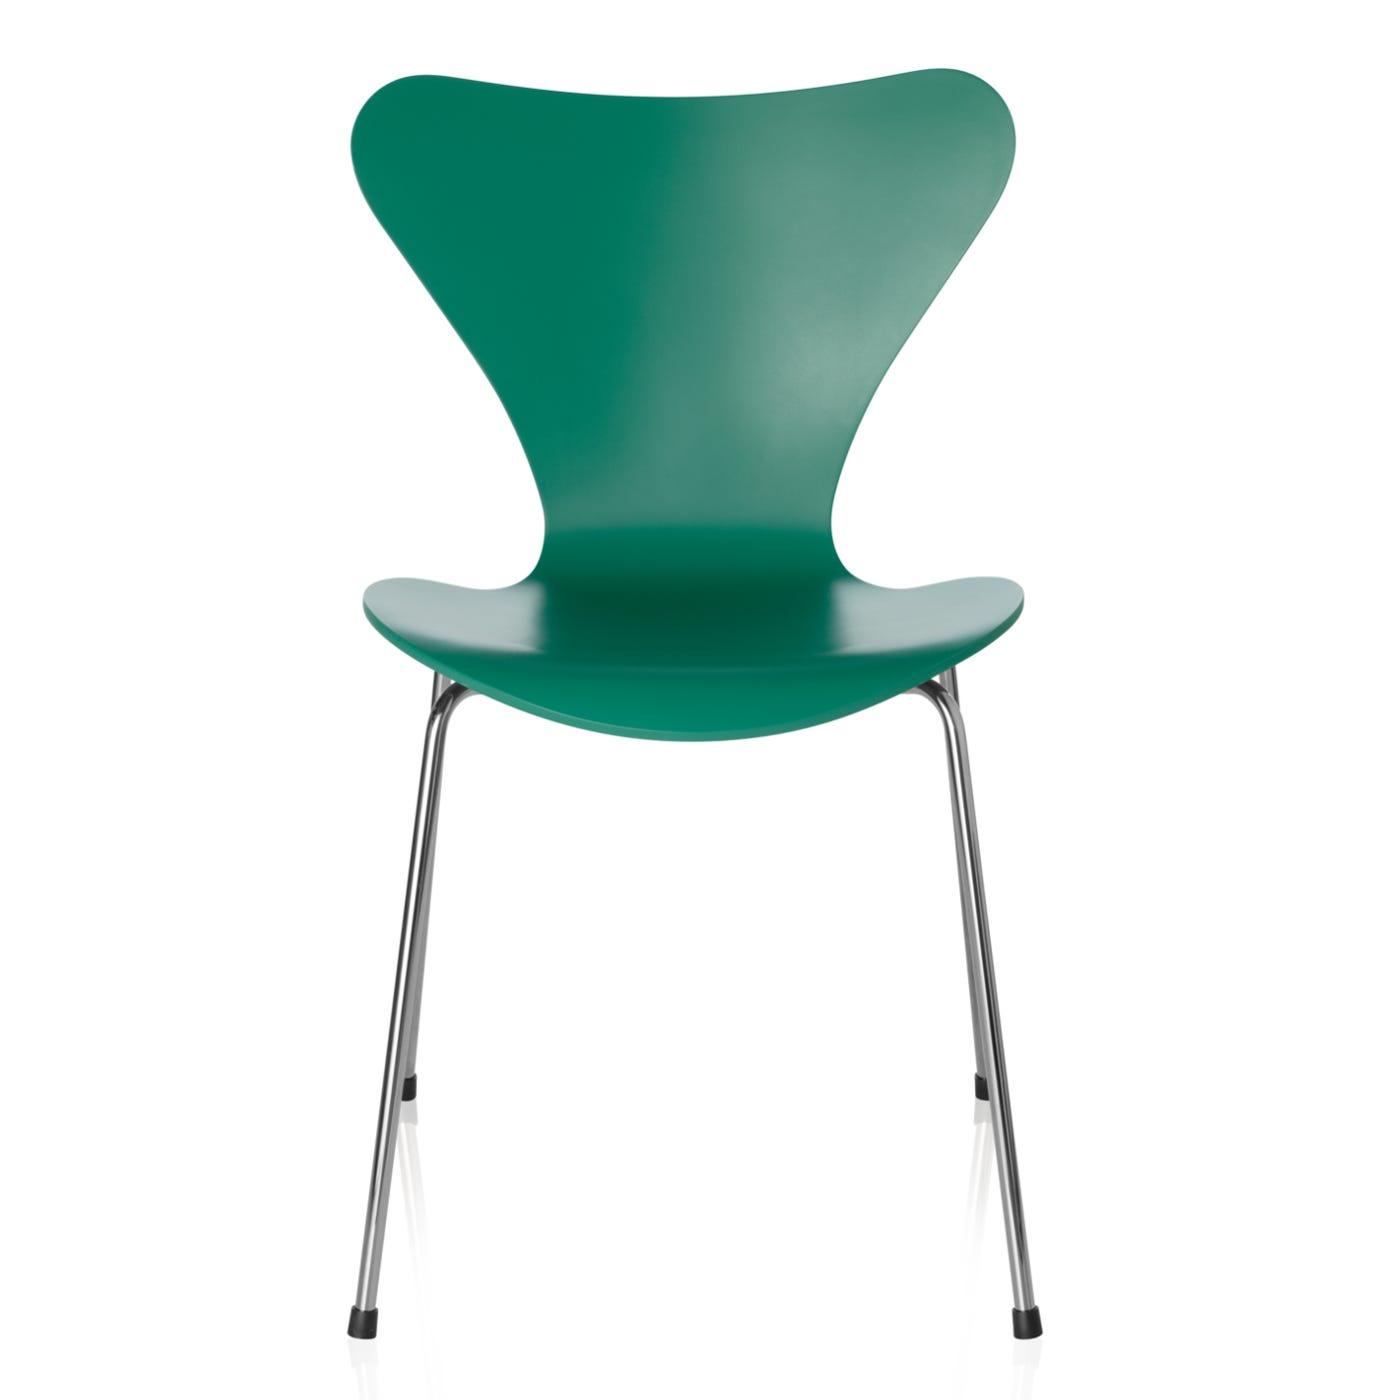 Series 7 Chair Huzun Green